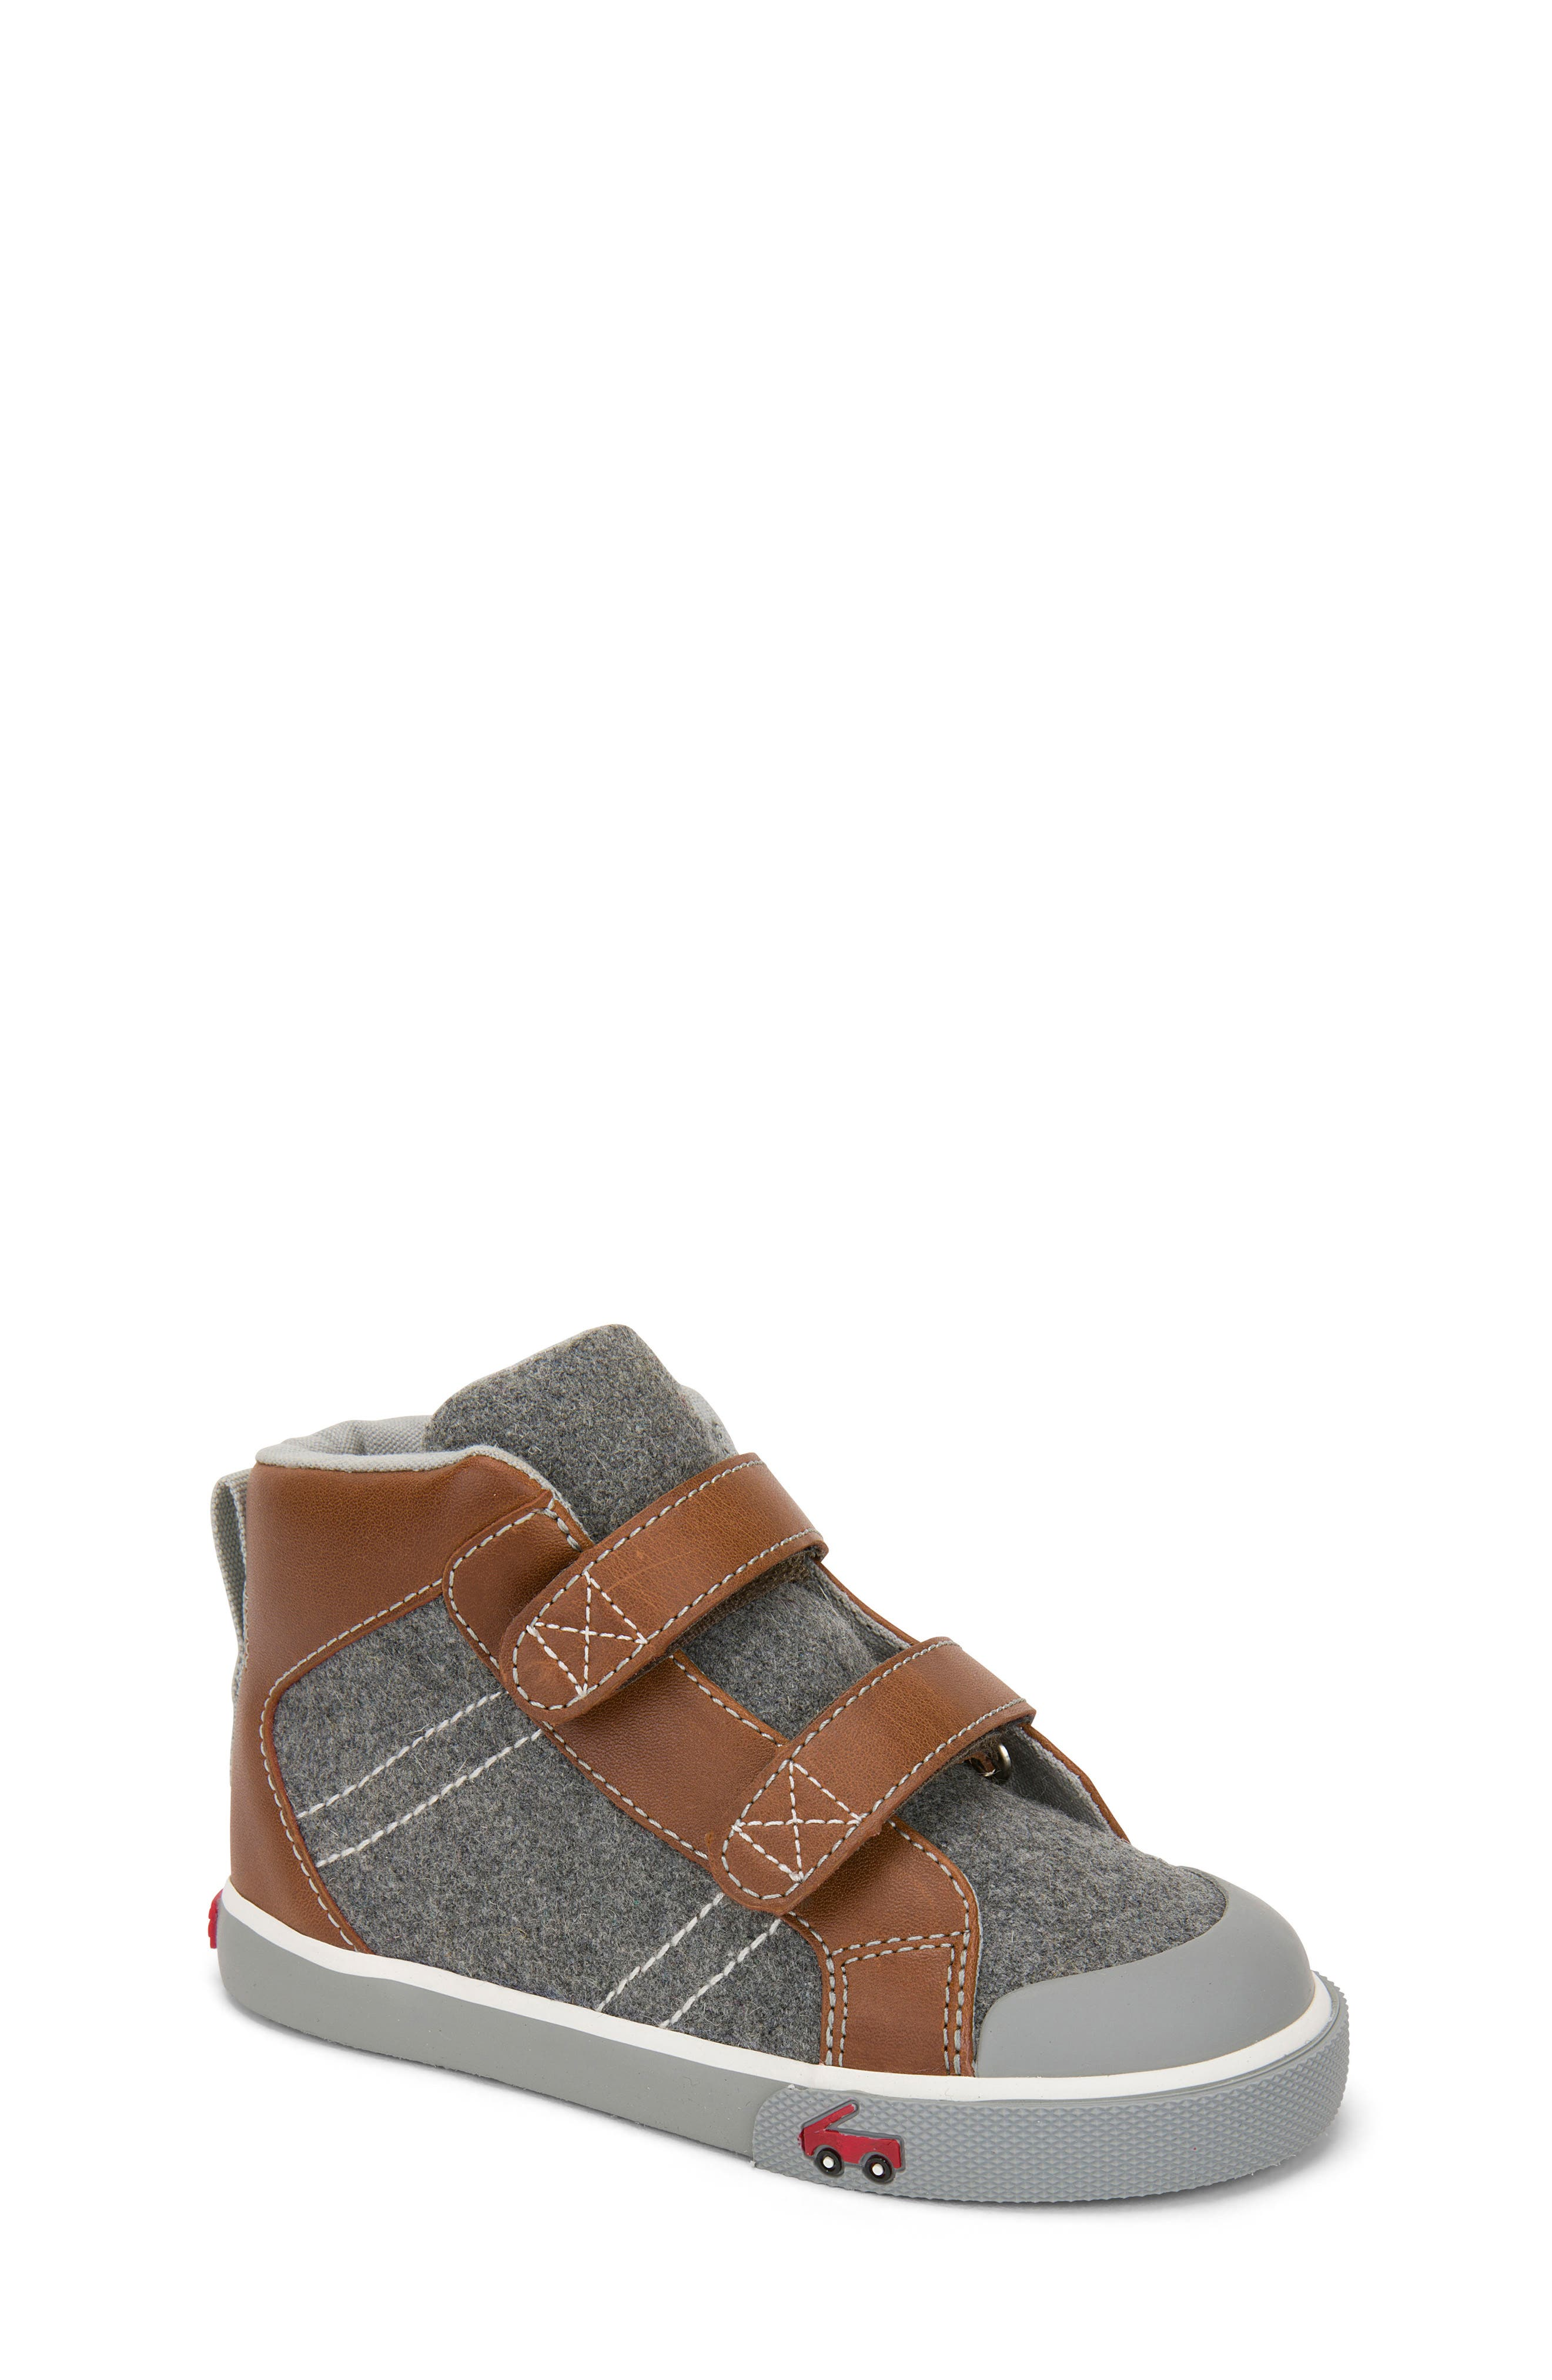 Matty Sneaker,                         Main,                         color, Gray Felt